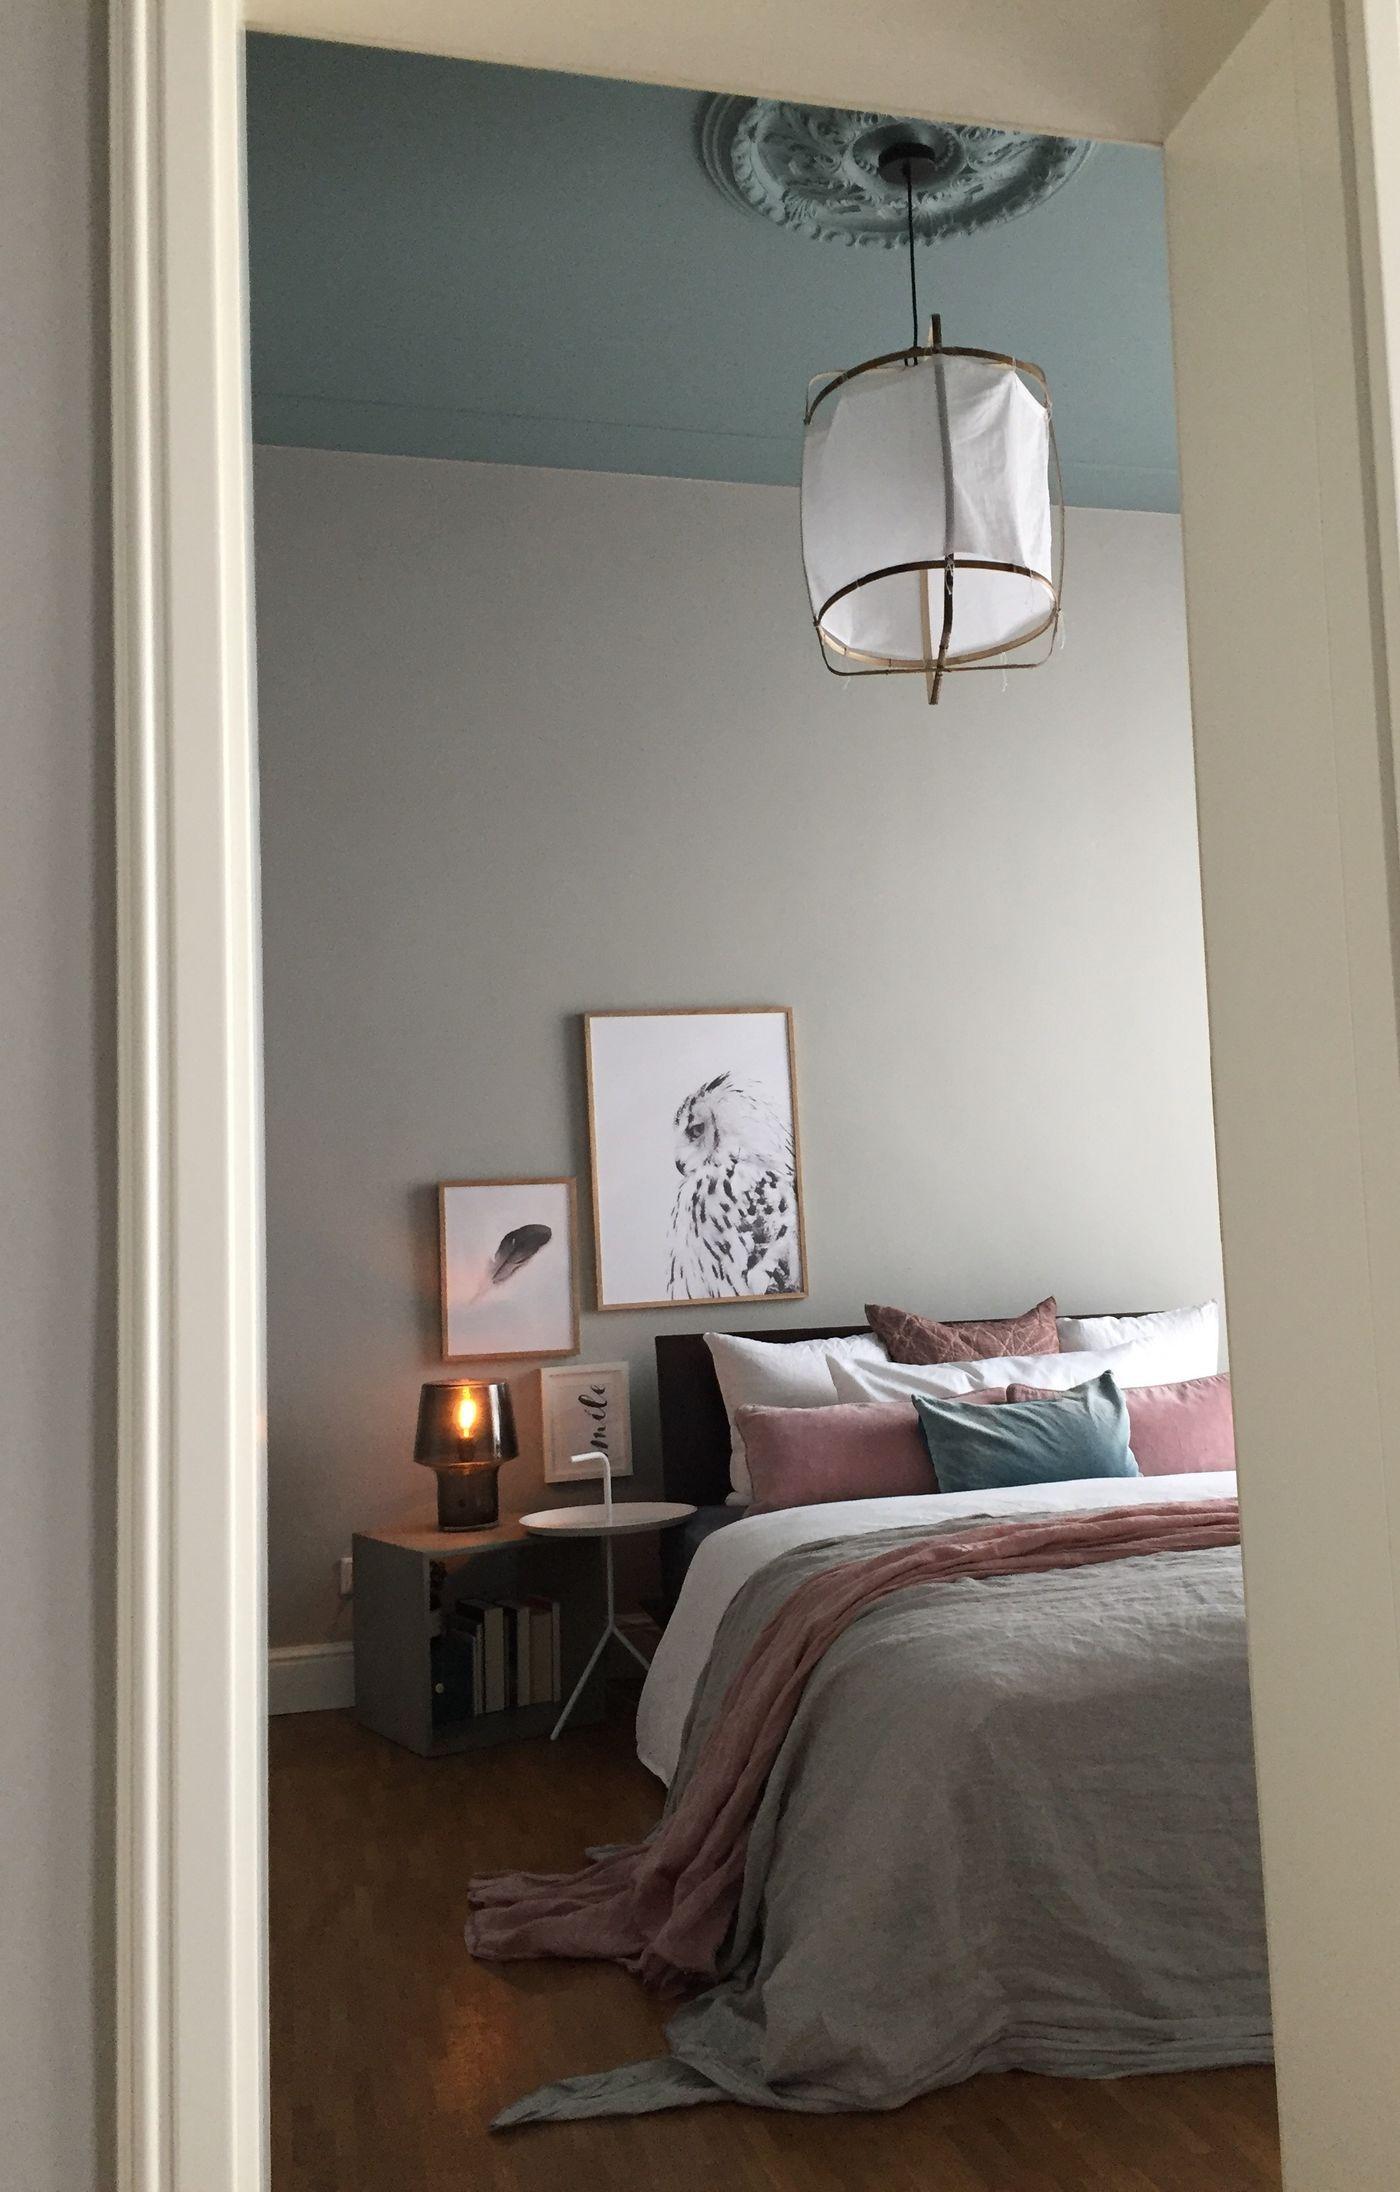 schlafzimmer wand hinter dem bett. Black Bedroom Furniture Sets. Home Design Ideas